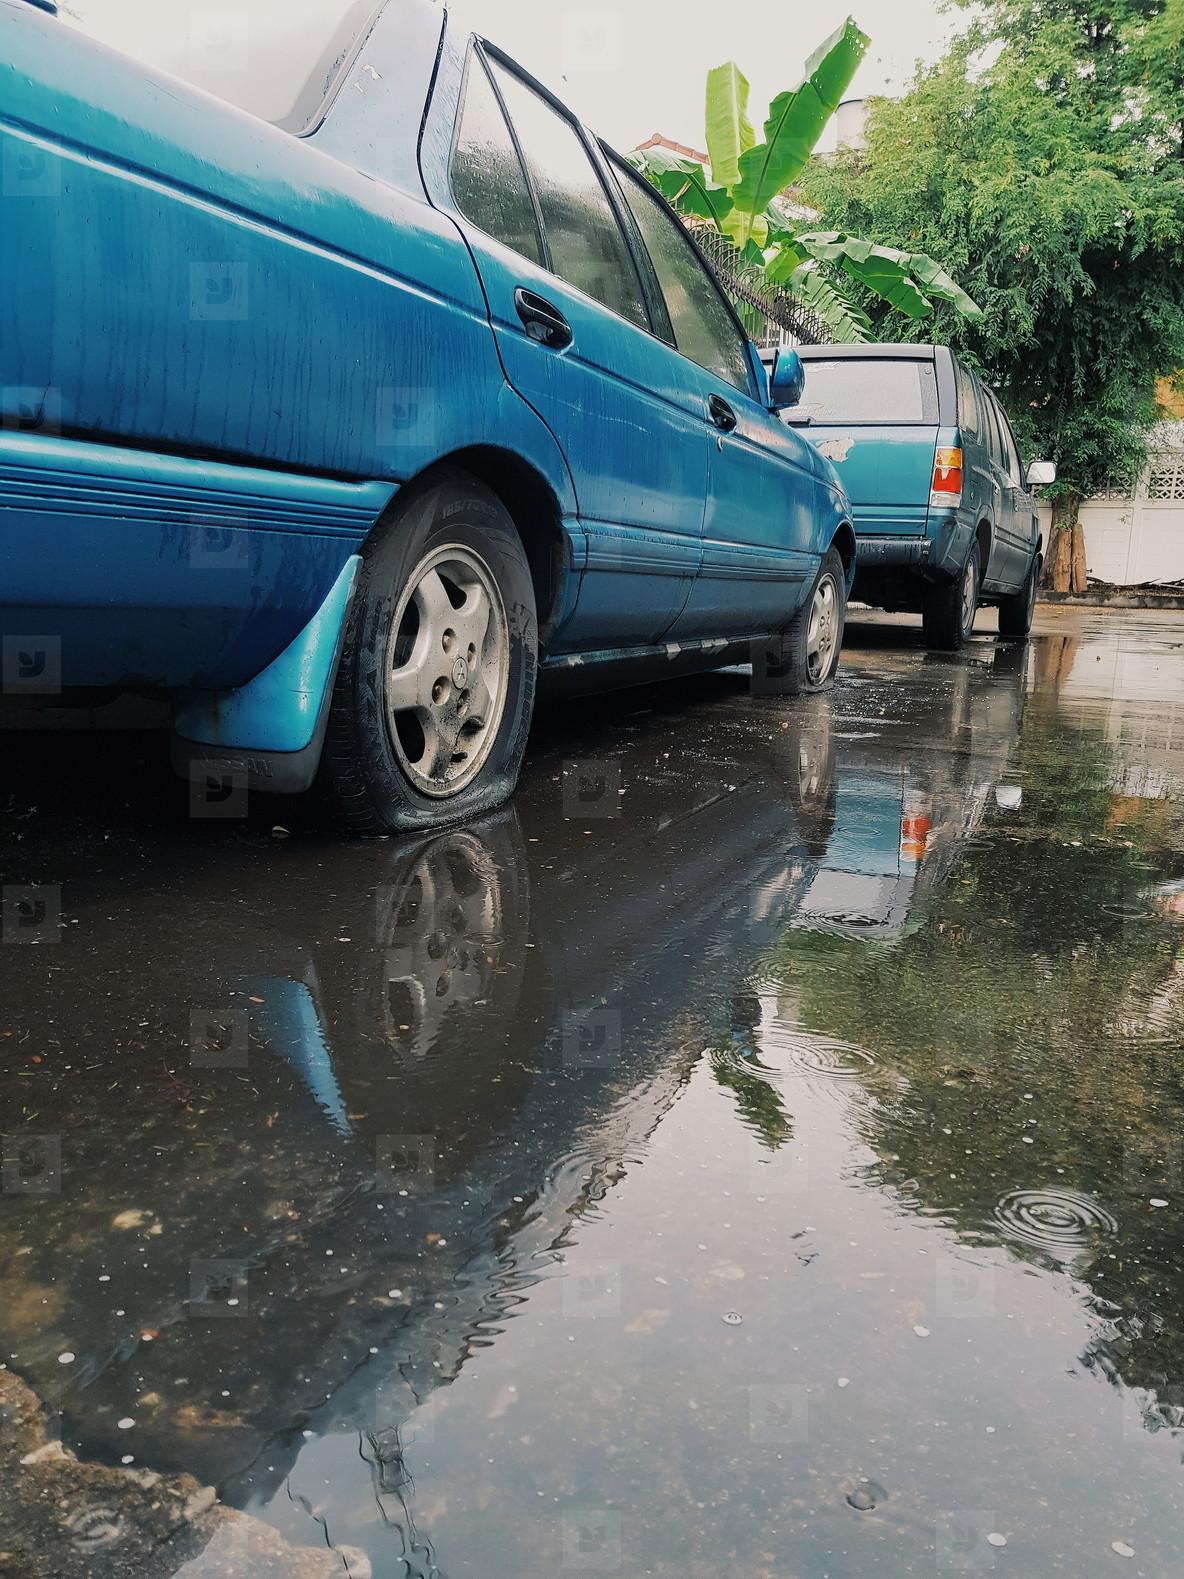 Flat tires of blue car